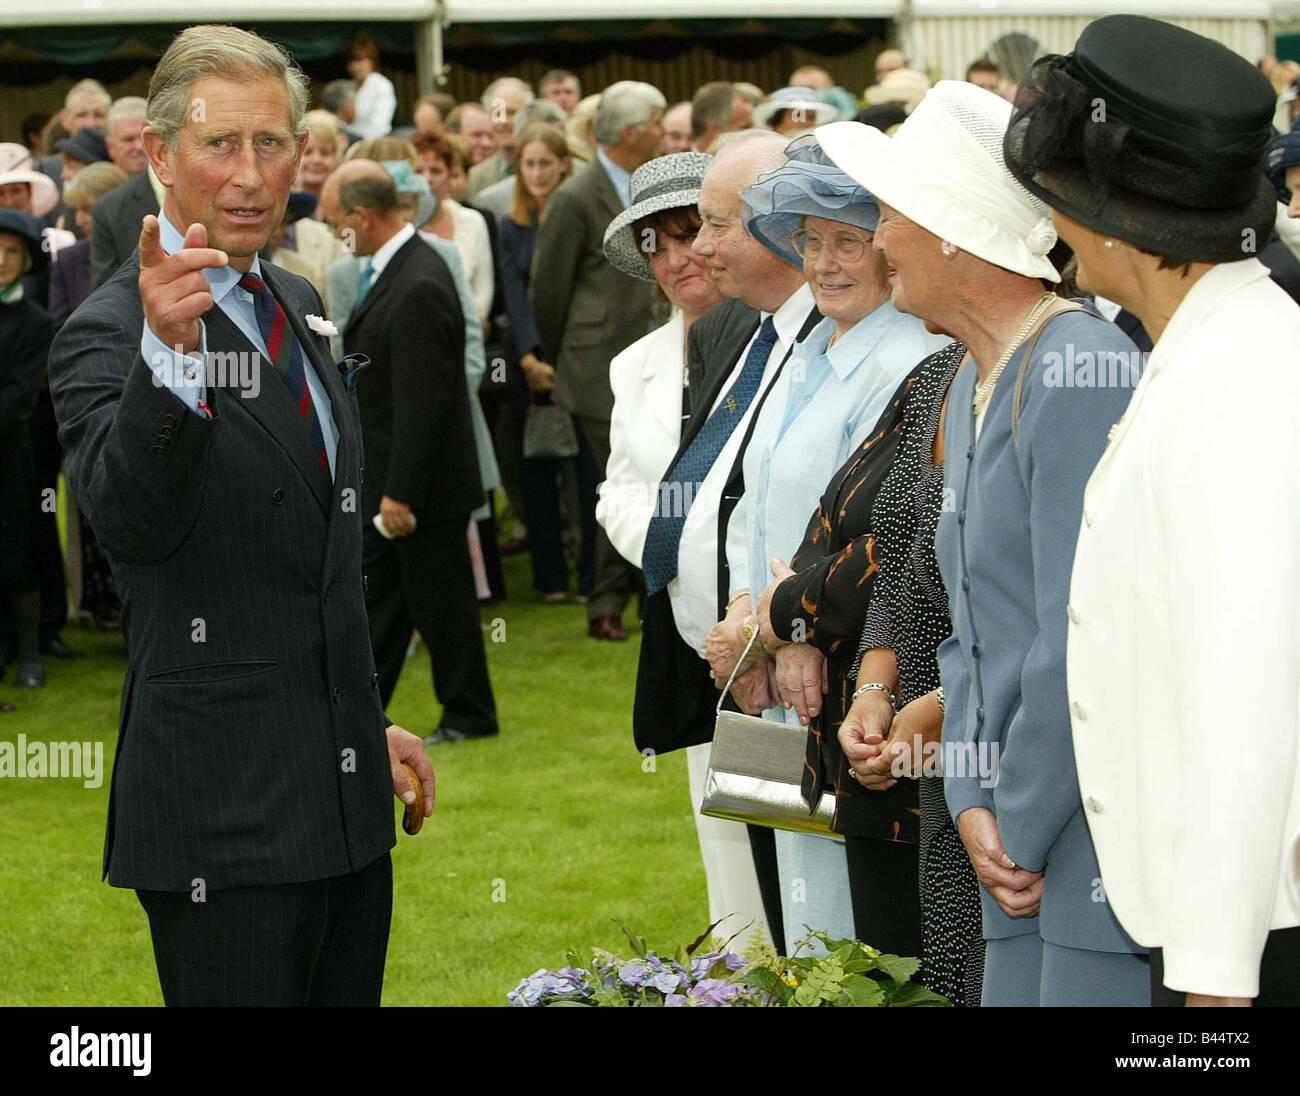 prince-charles-at-hillsborough-castle-garden-party-september-2003-B44TX2.jpg